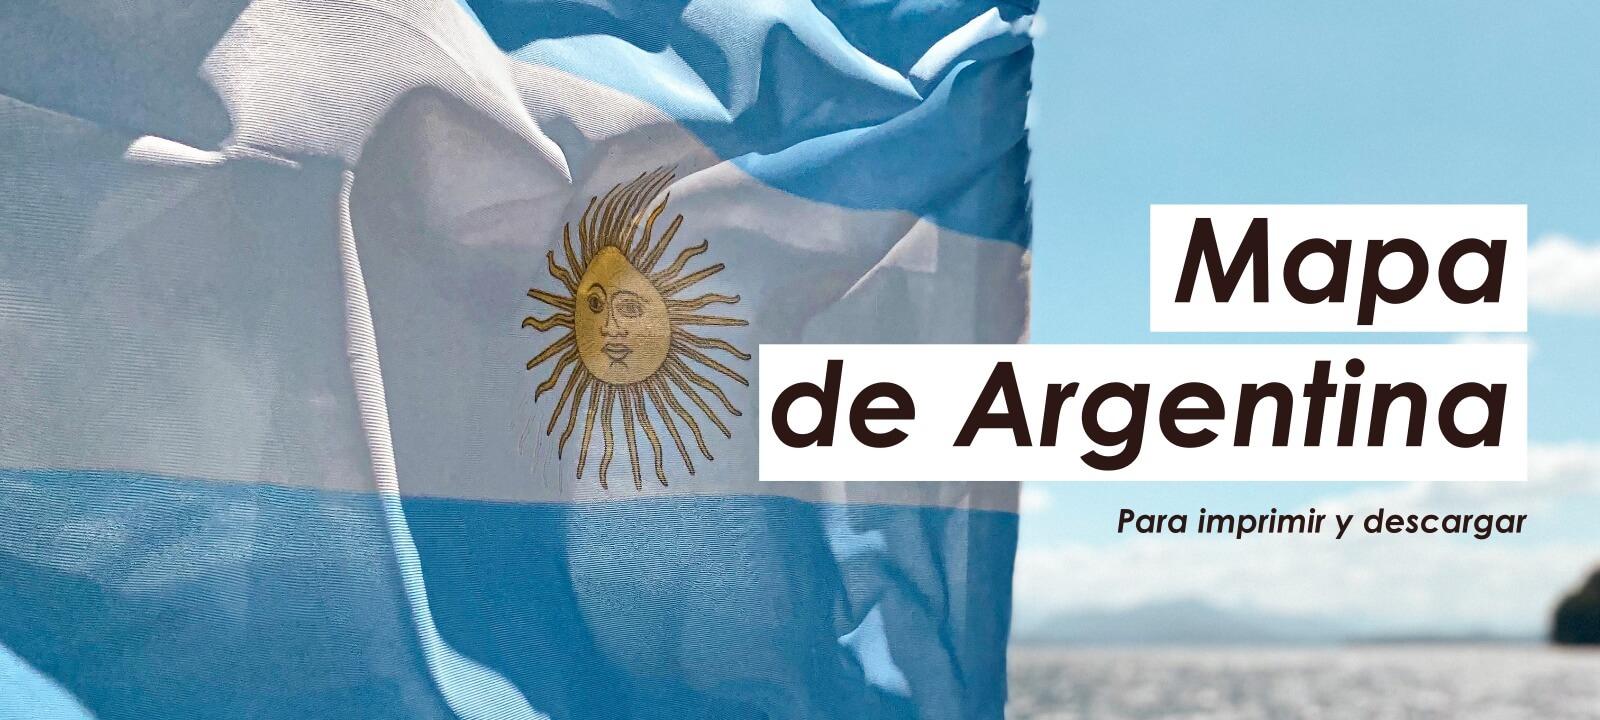 mapa de argentina para imprimir